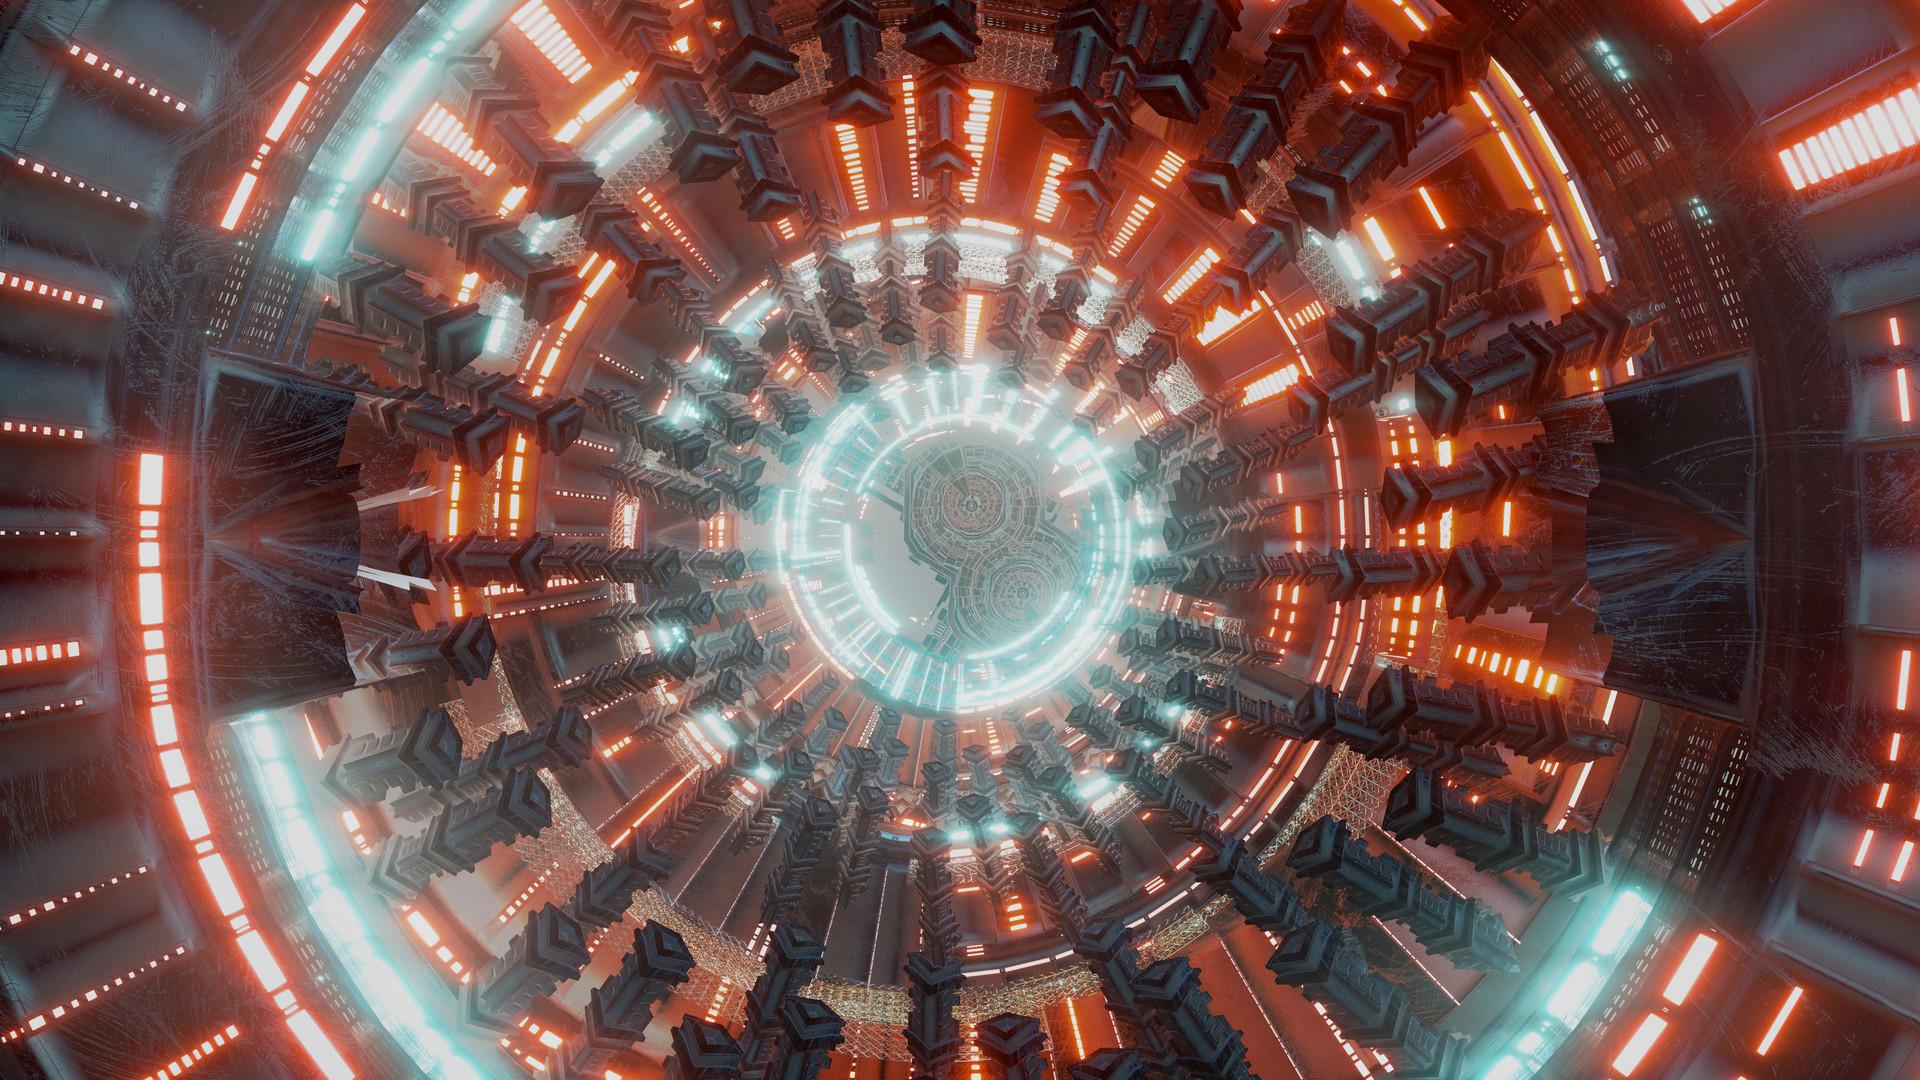 Kresimir jelusic robob3ar 261 300616 rotator 5k